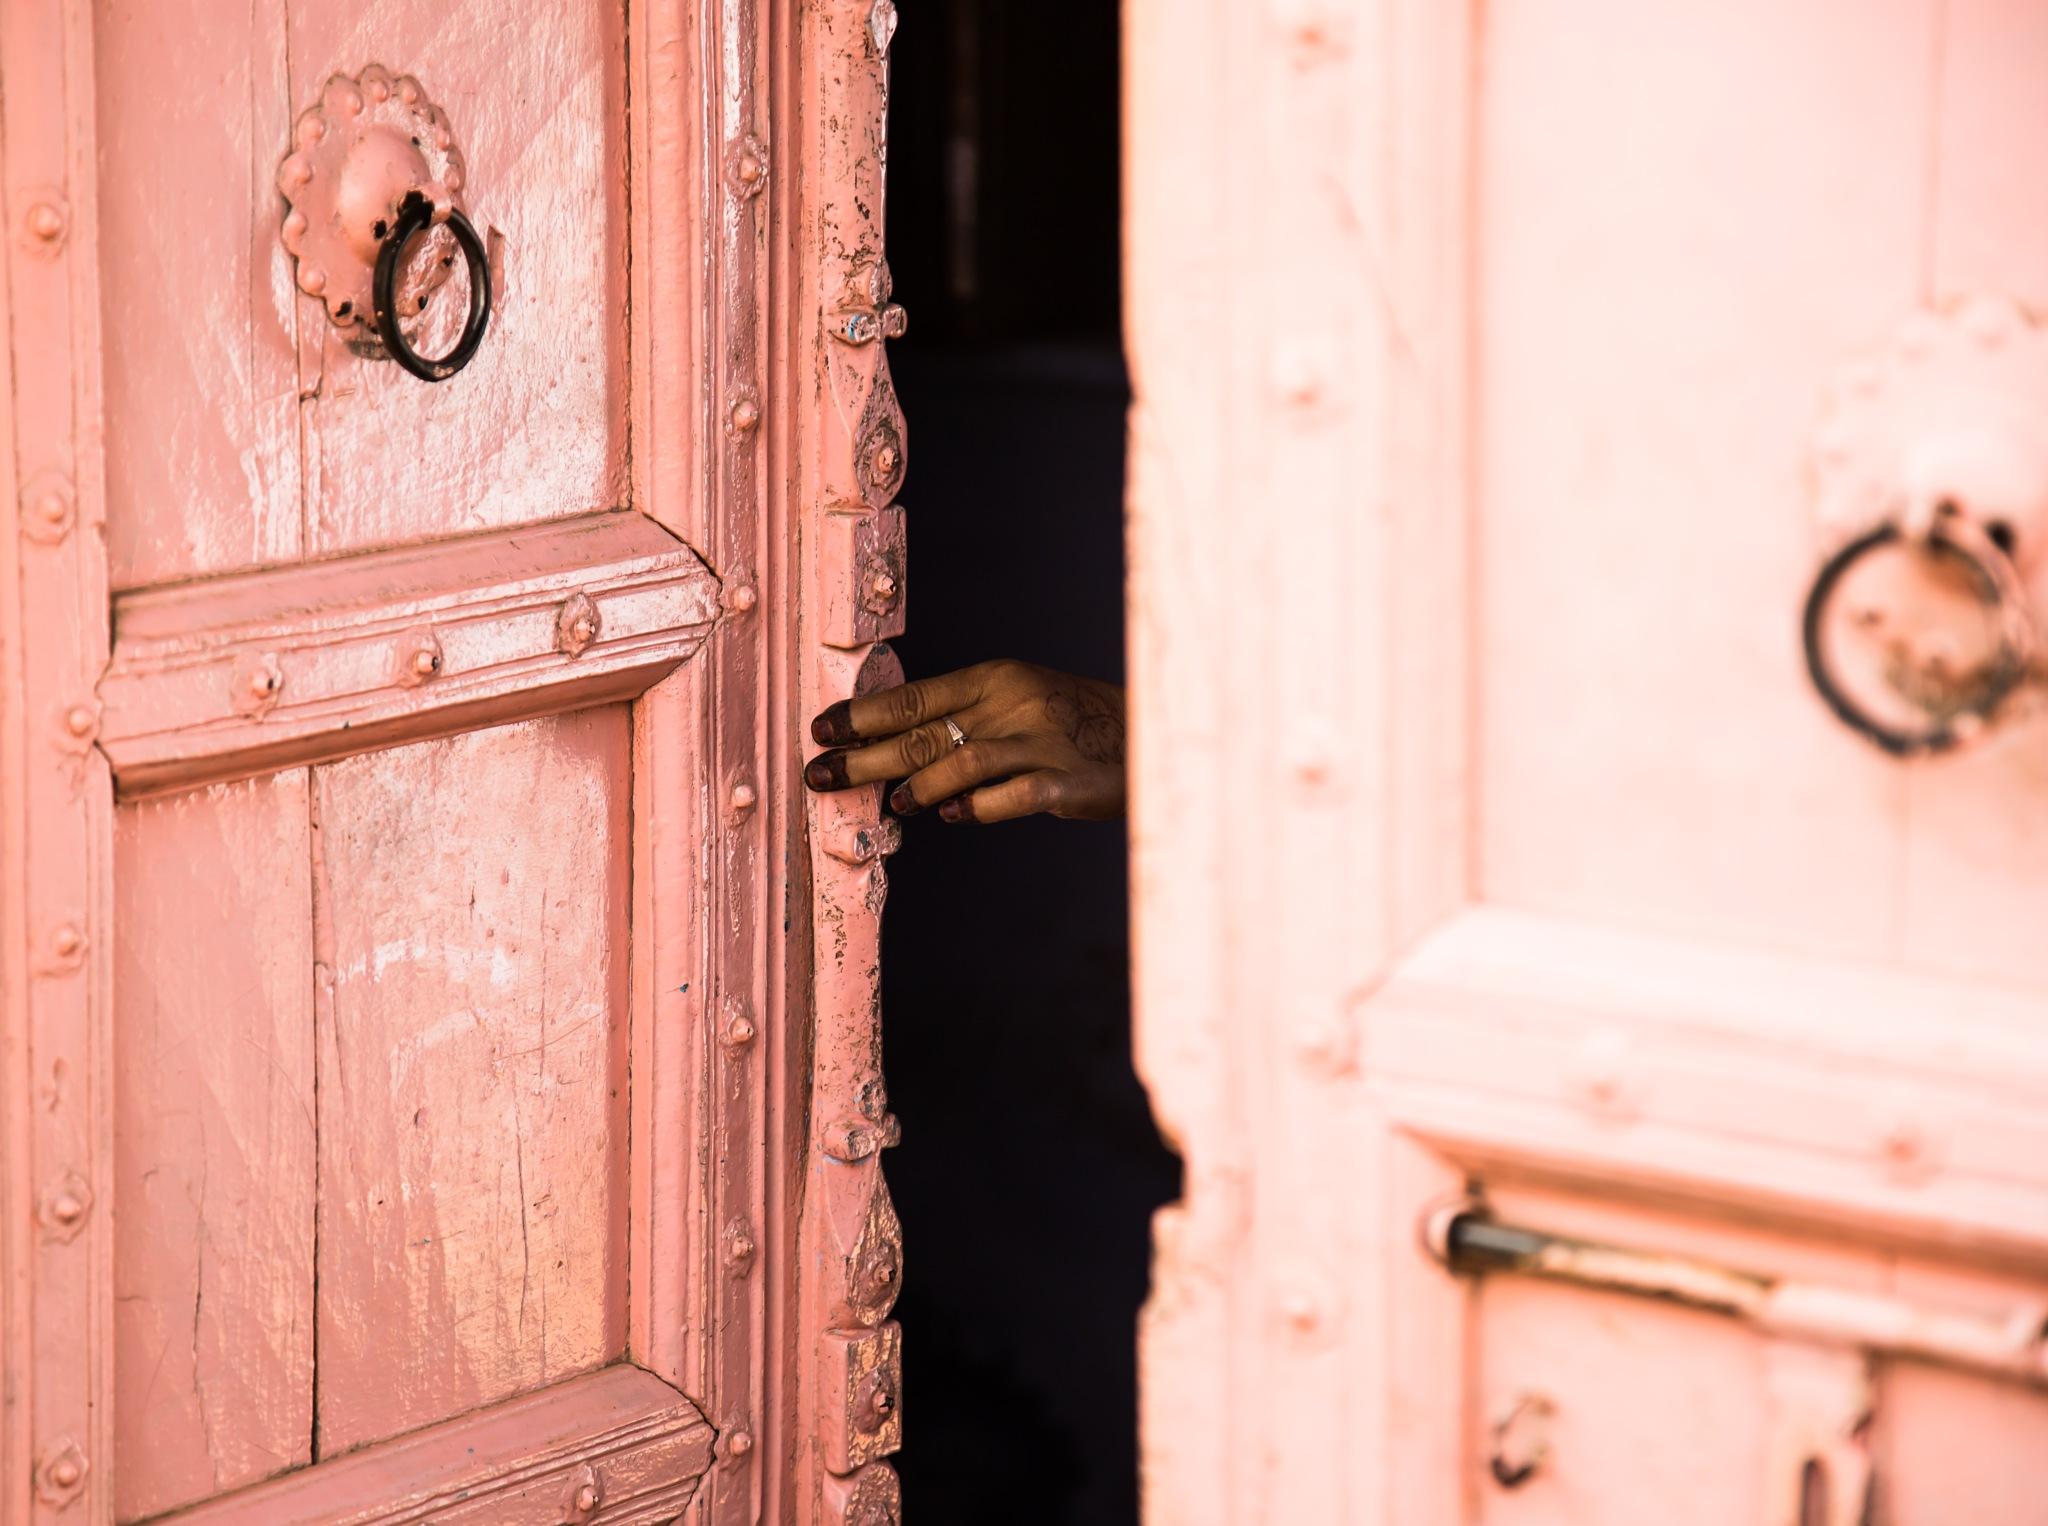 open the door by Saverio Nocentini